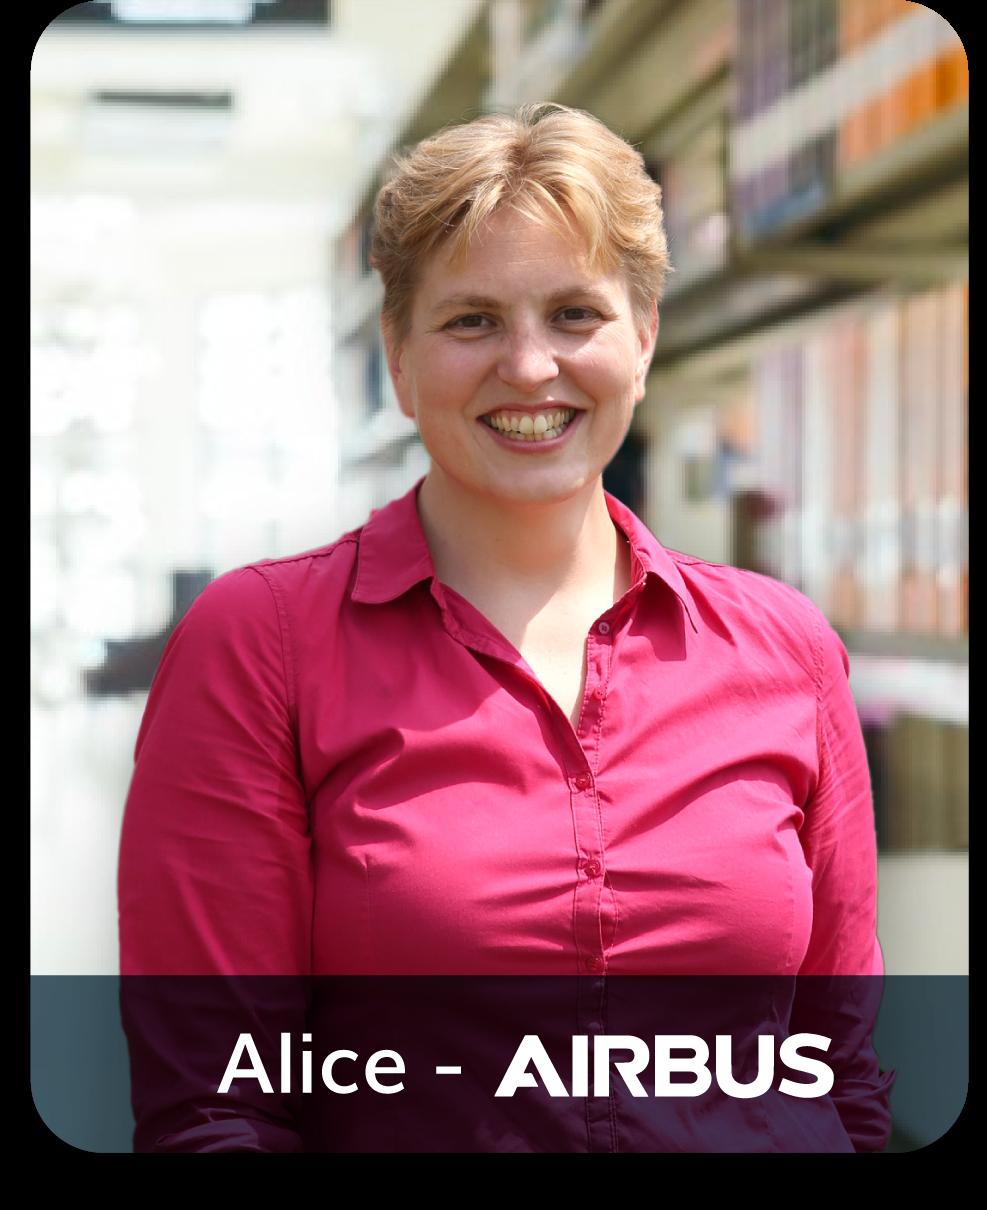 Alice Airbus positive leader